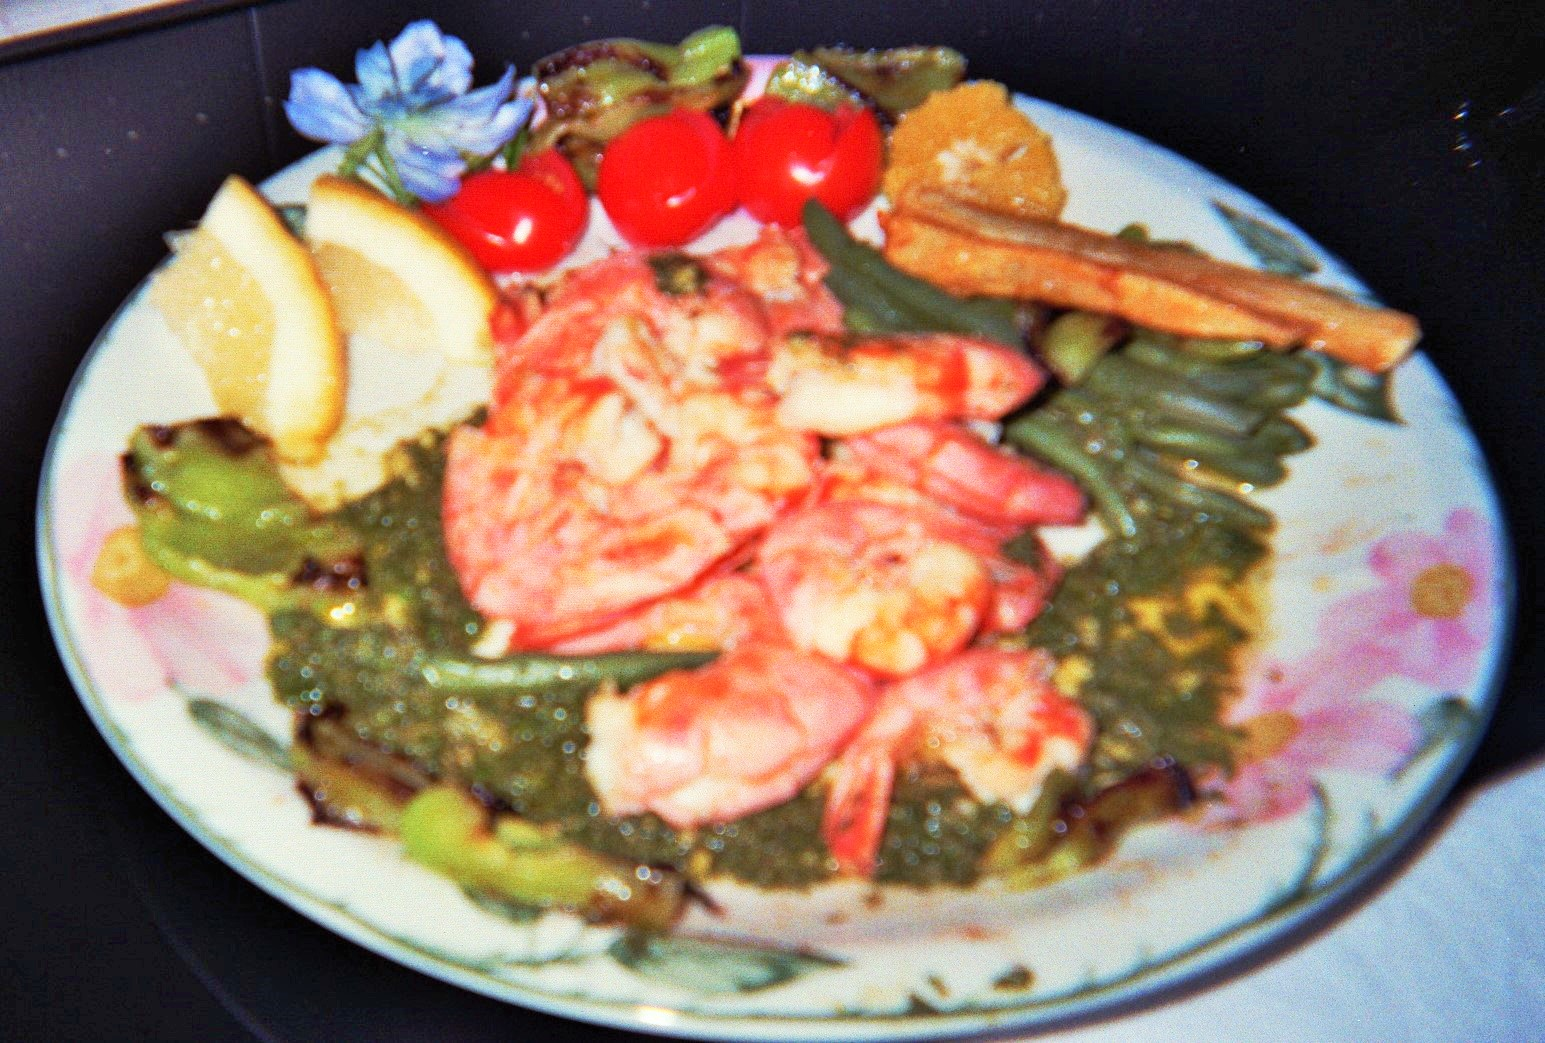 gamberoni in un letto di verdure verdi in salsa